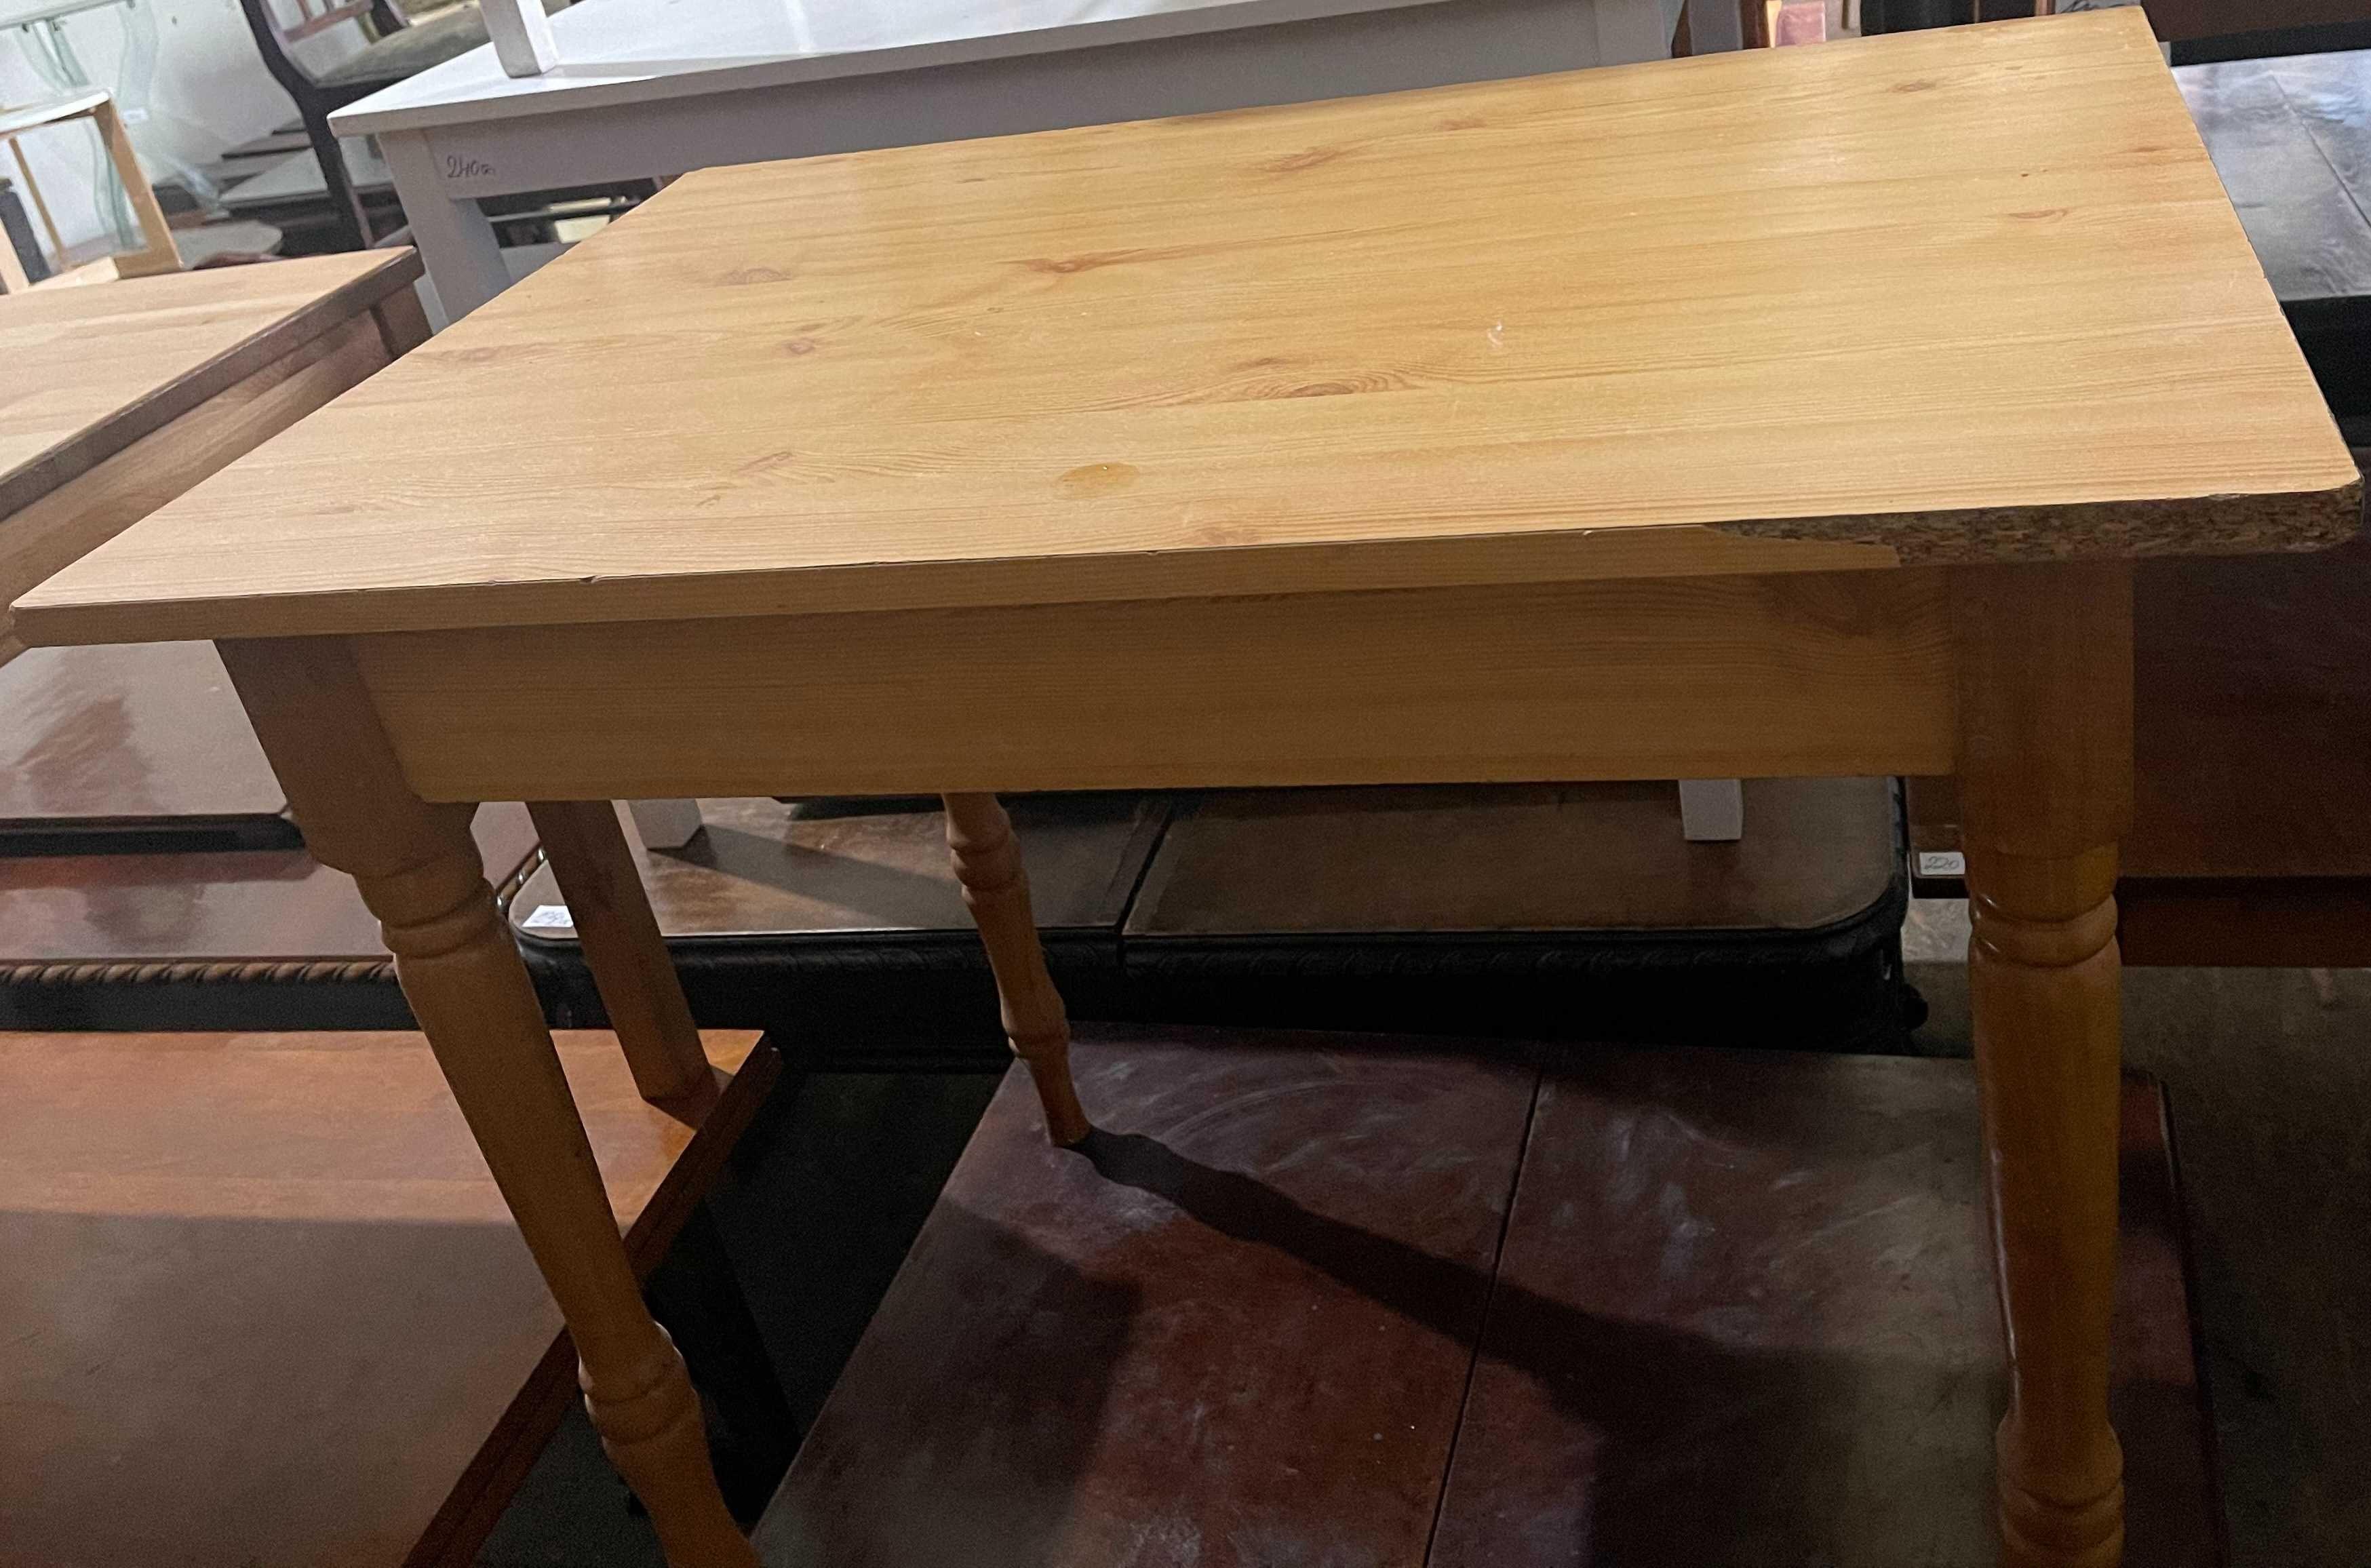 Masa solida de bucatarie din lemn masiv; Masuta cu blat 90x60